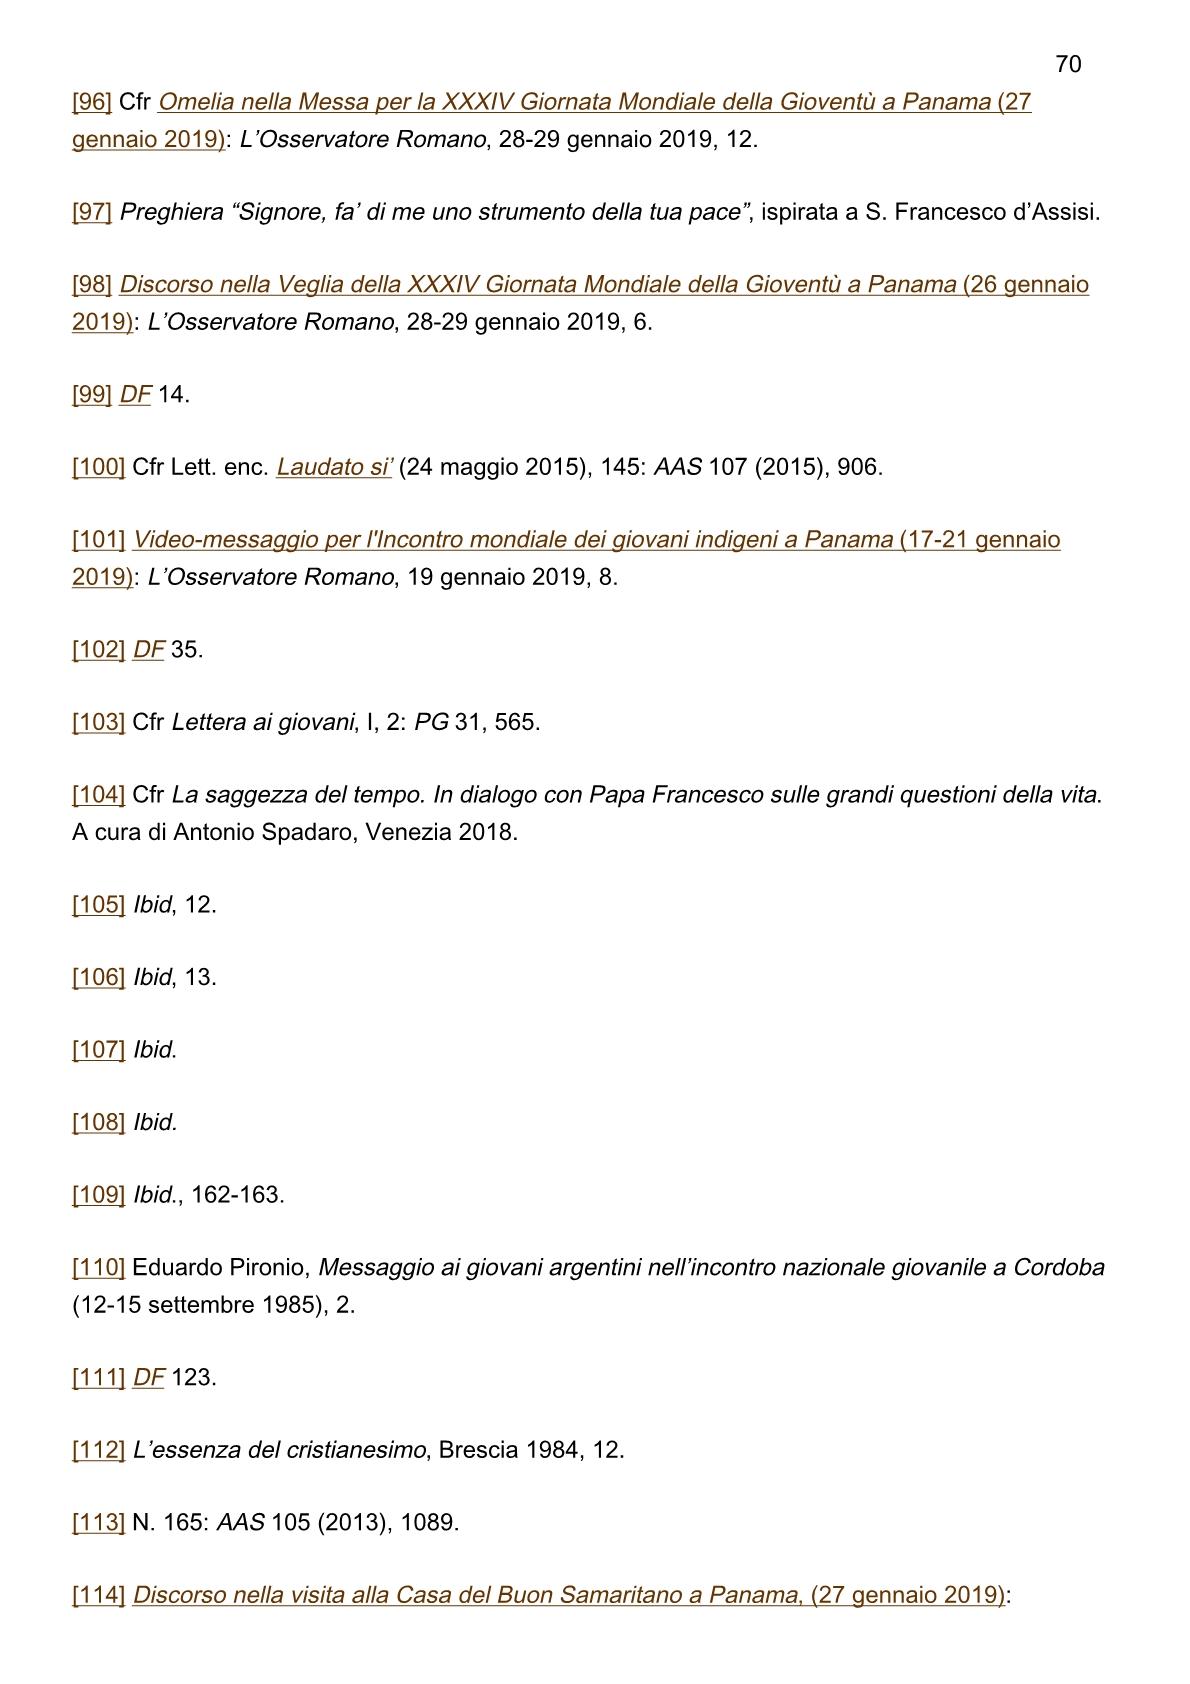 papa-francesco_esortazione-ap_20190325_christus-vivit70